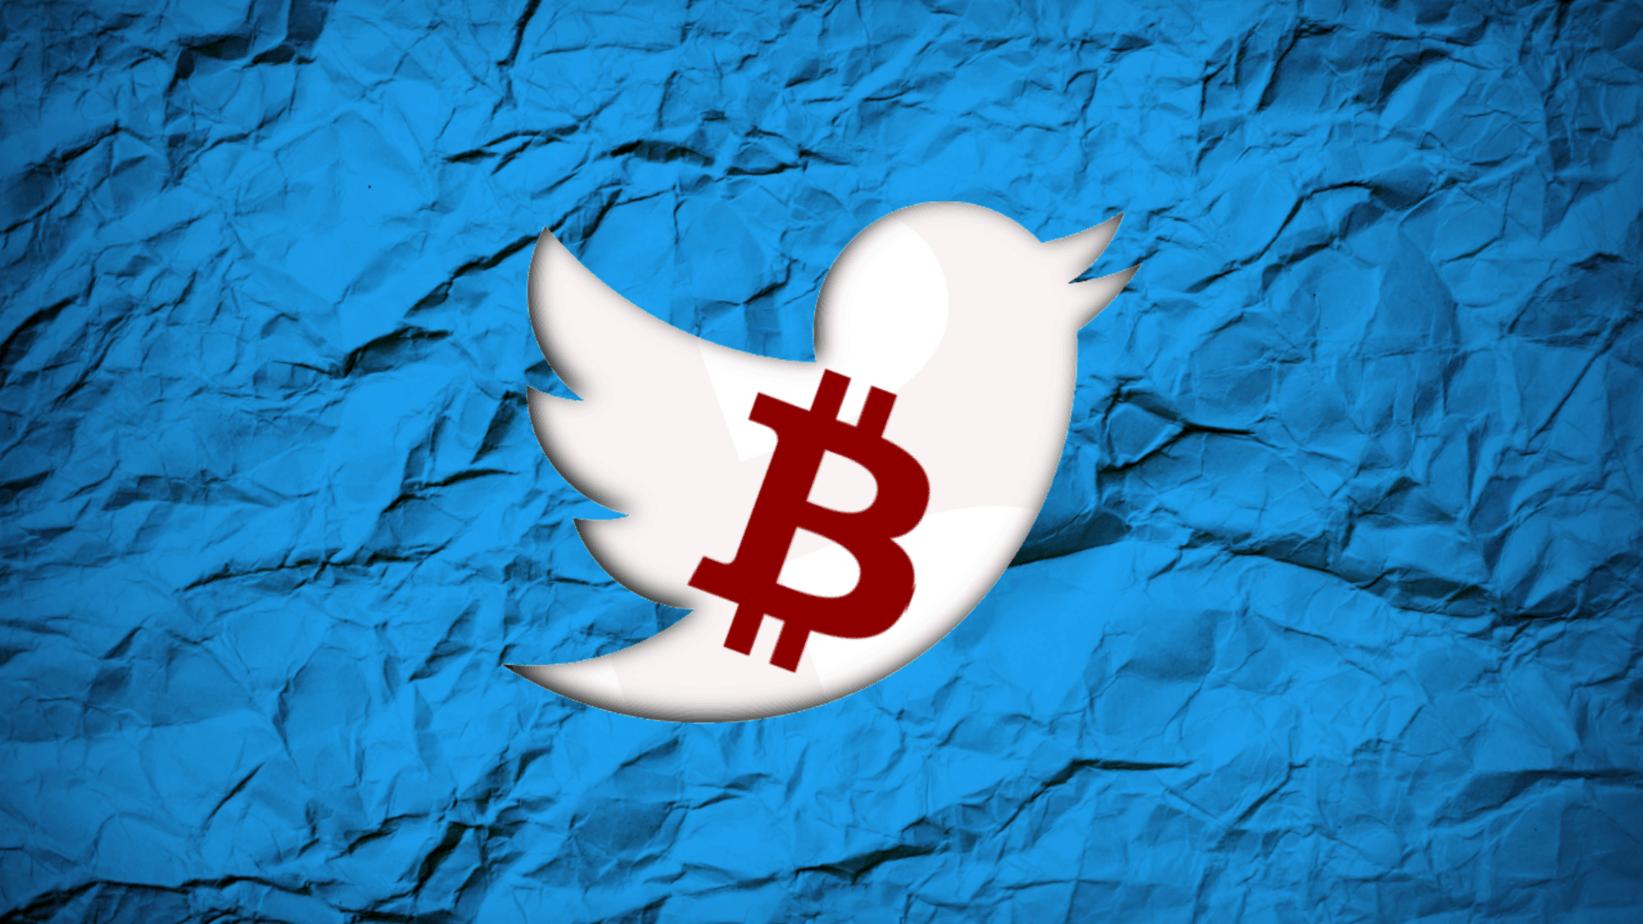 Twitter Cyberattack